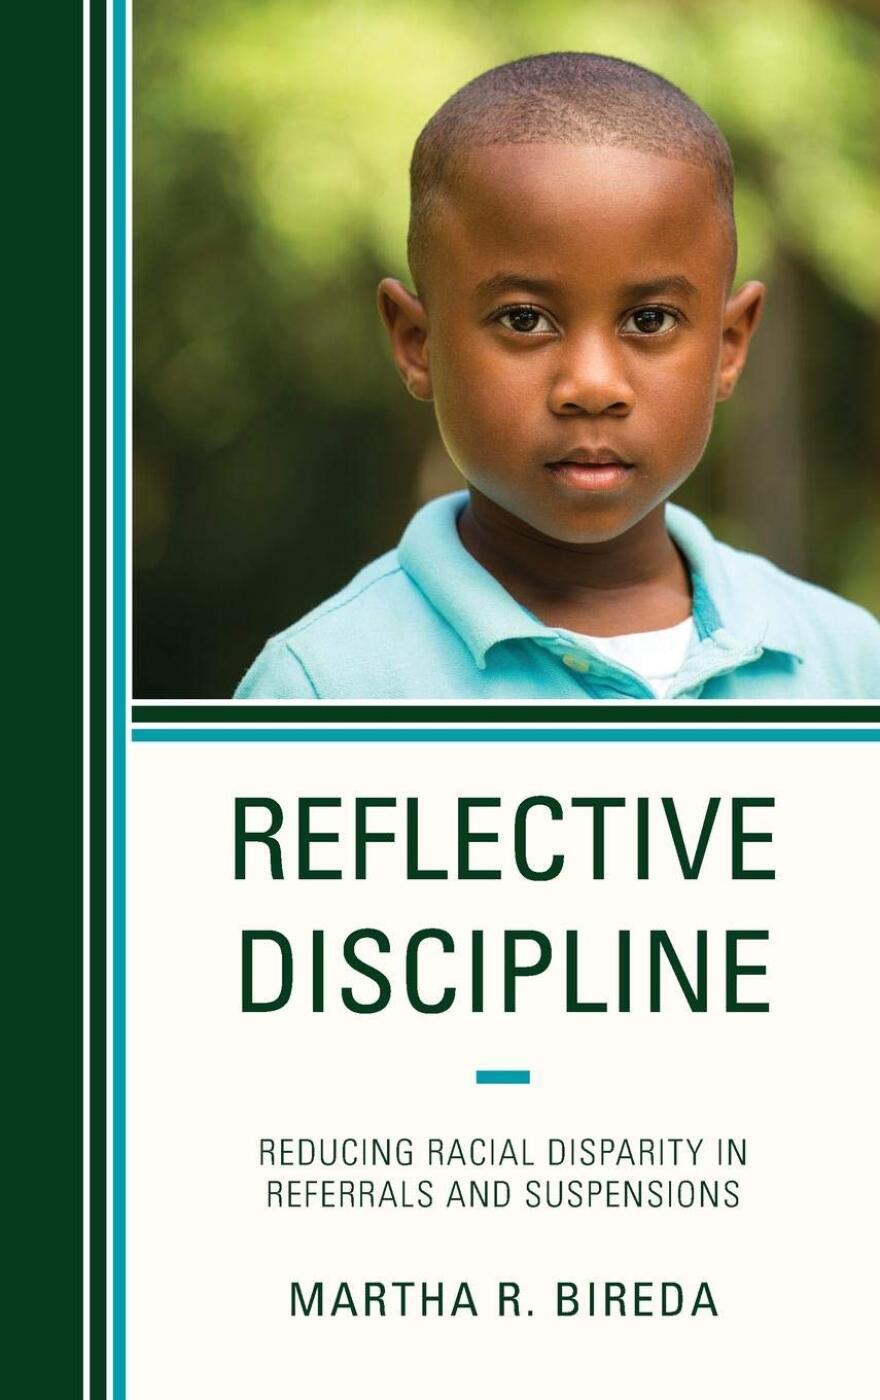 reflective_discipline_cover.jpg